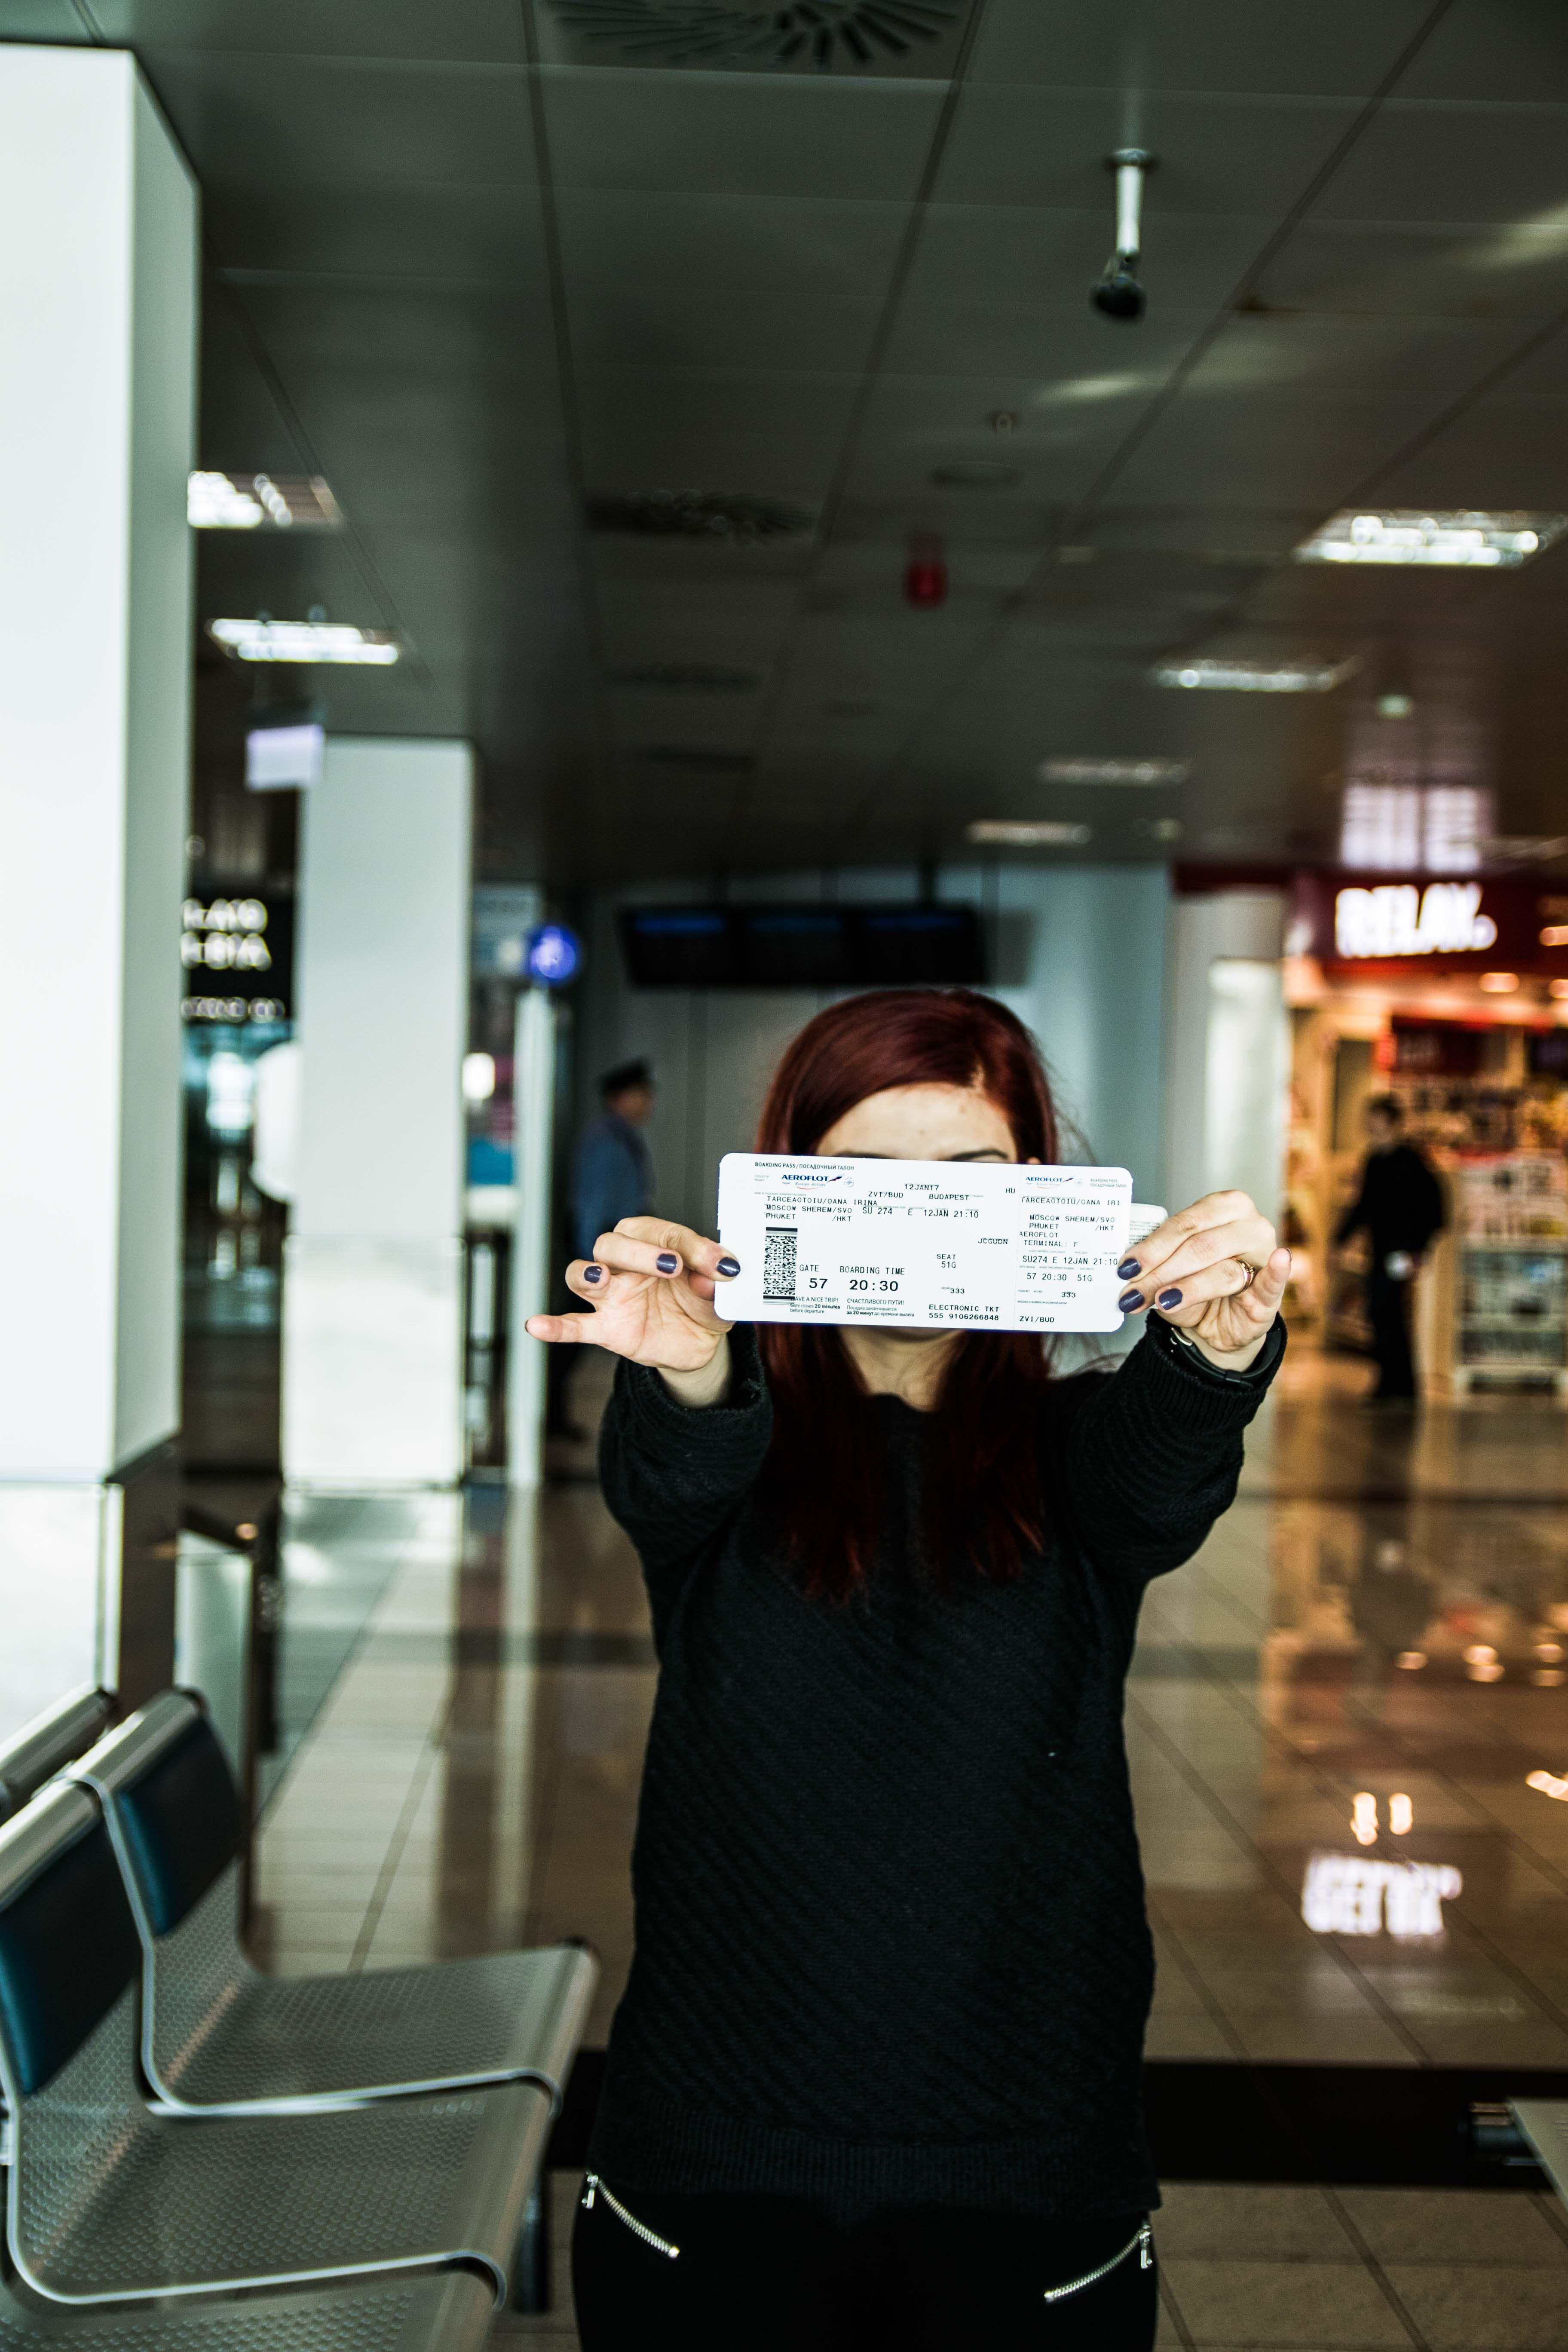 phuket trip passport ticket photography